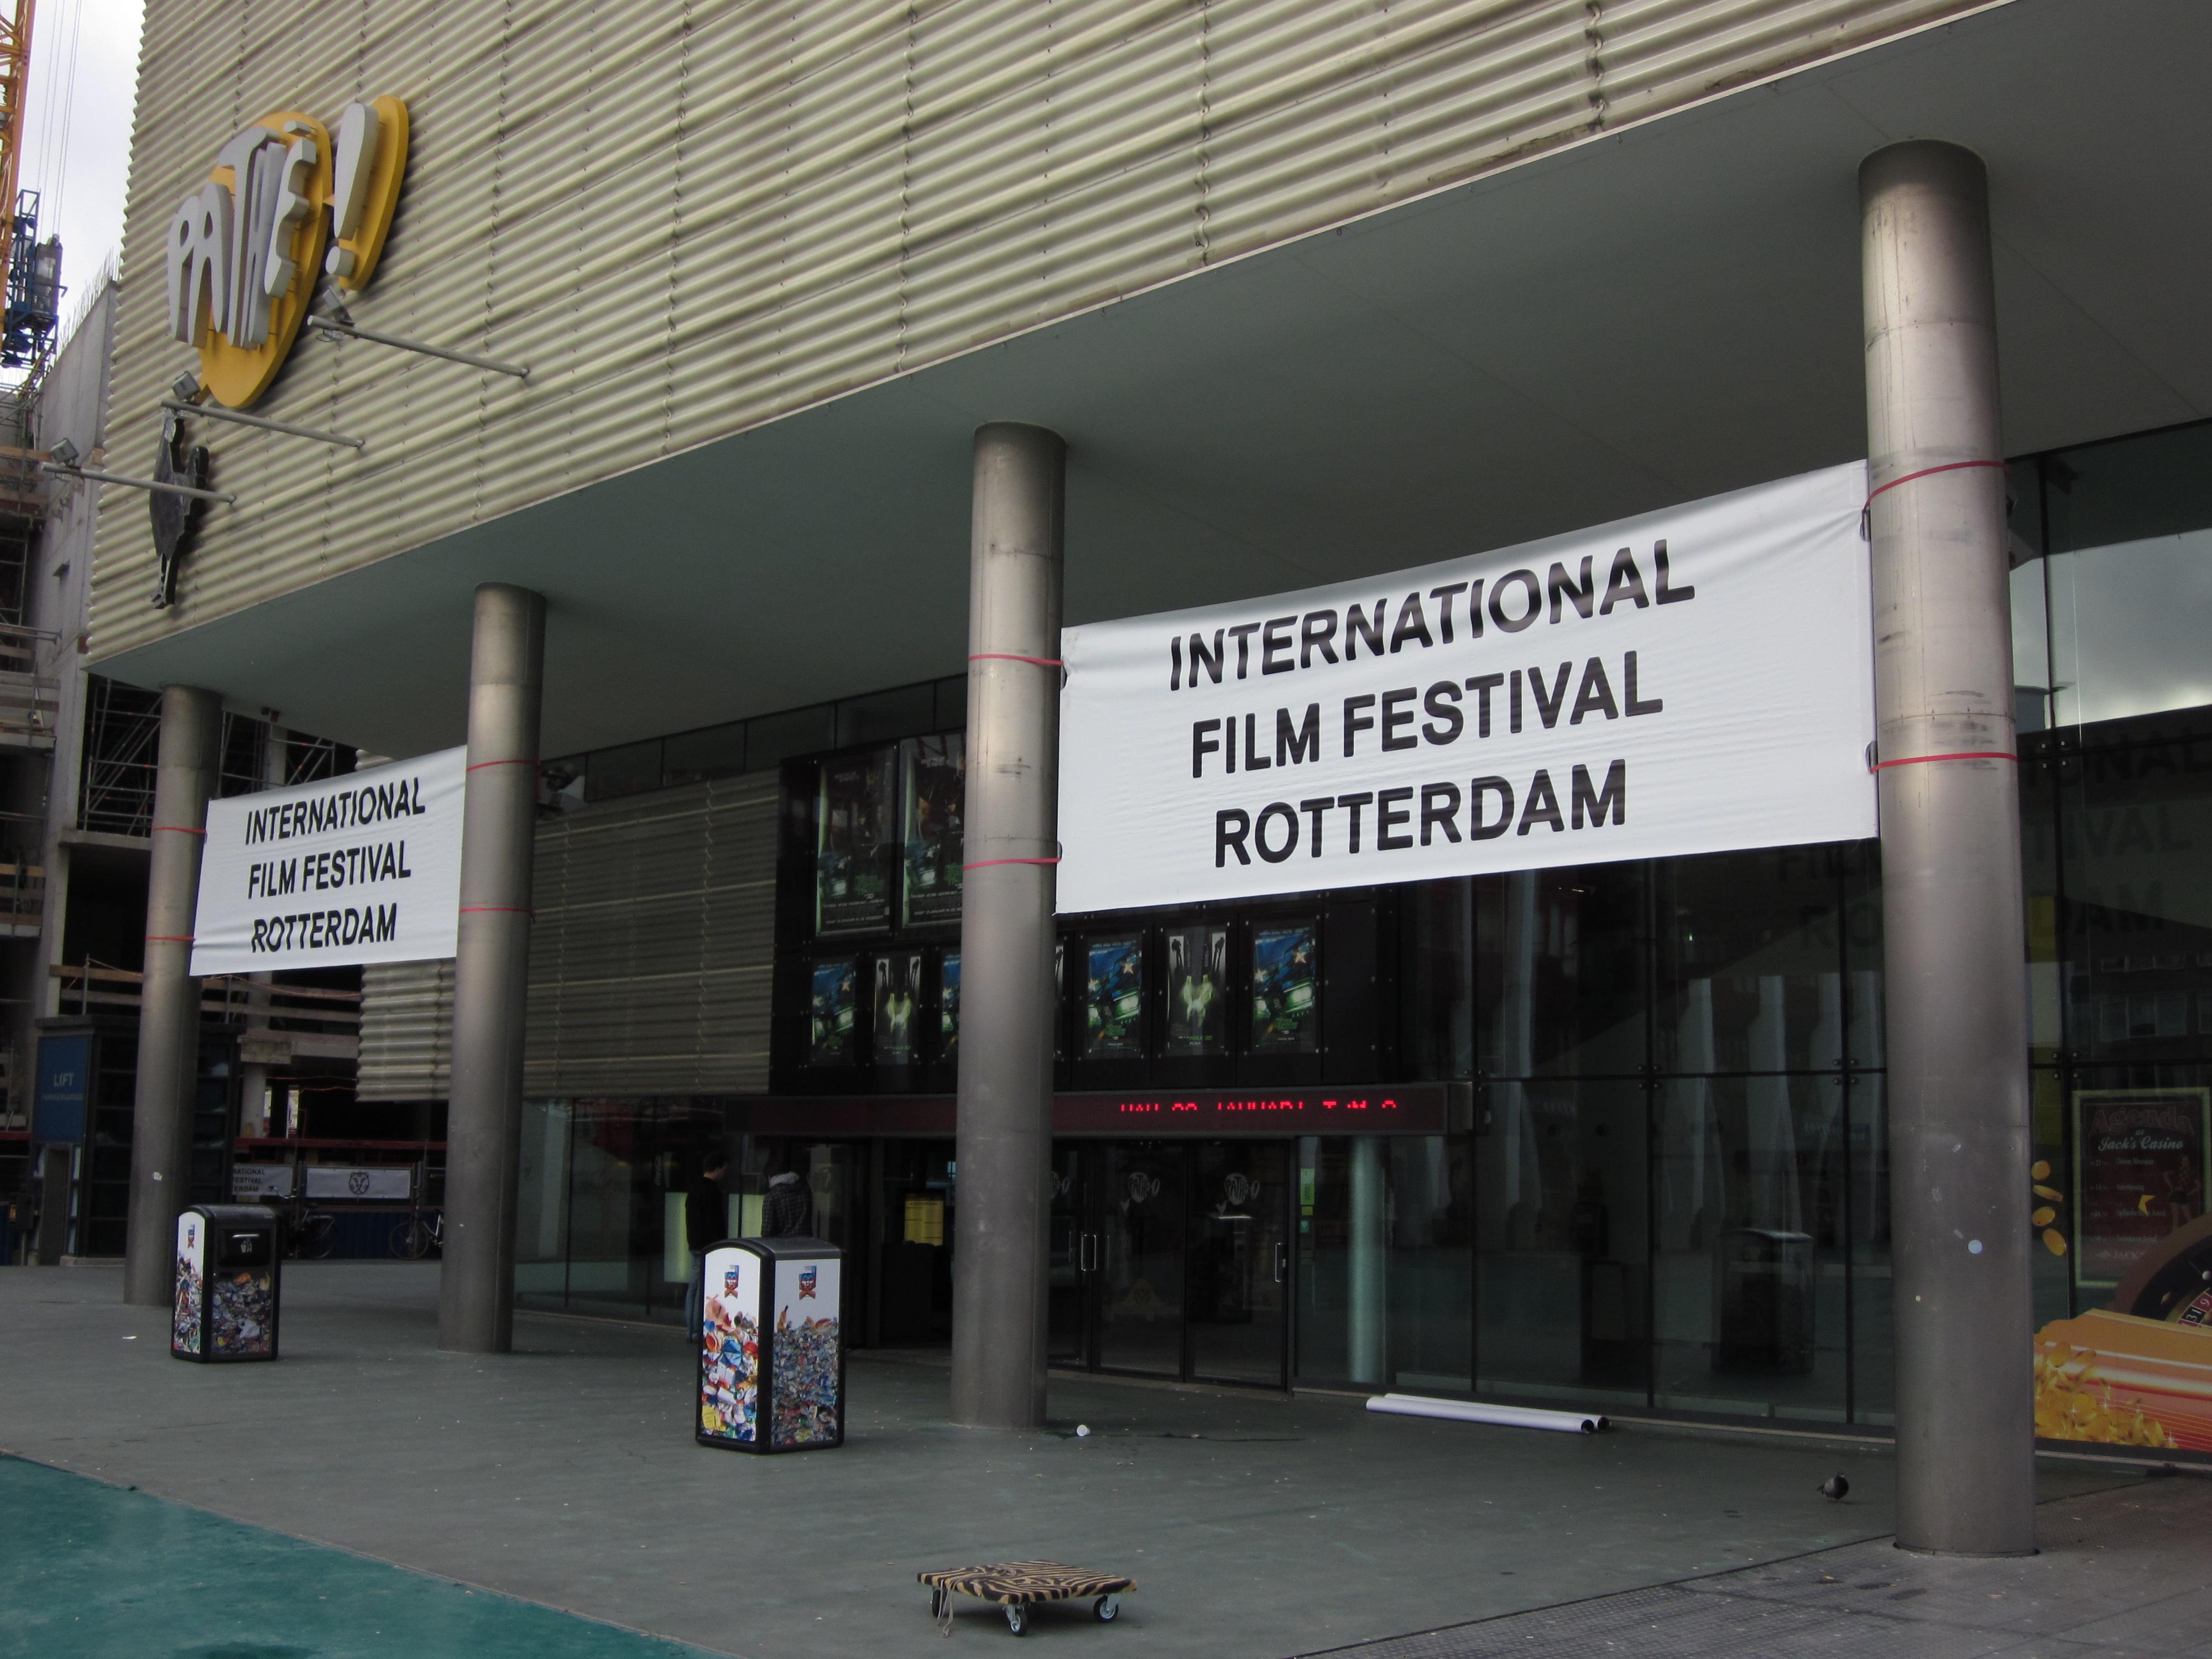 International film festival rotterdam 2011 waar is de for Rotterdam film